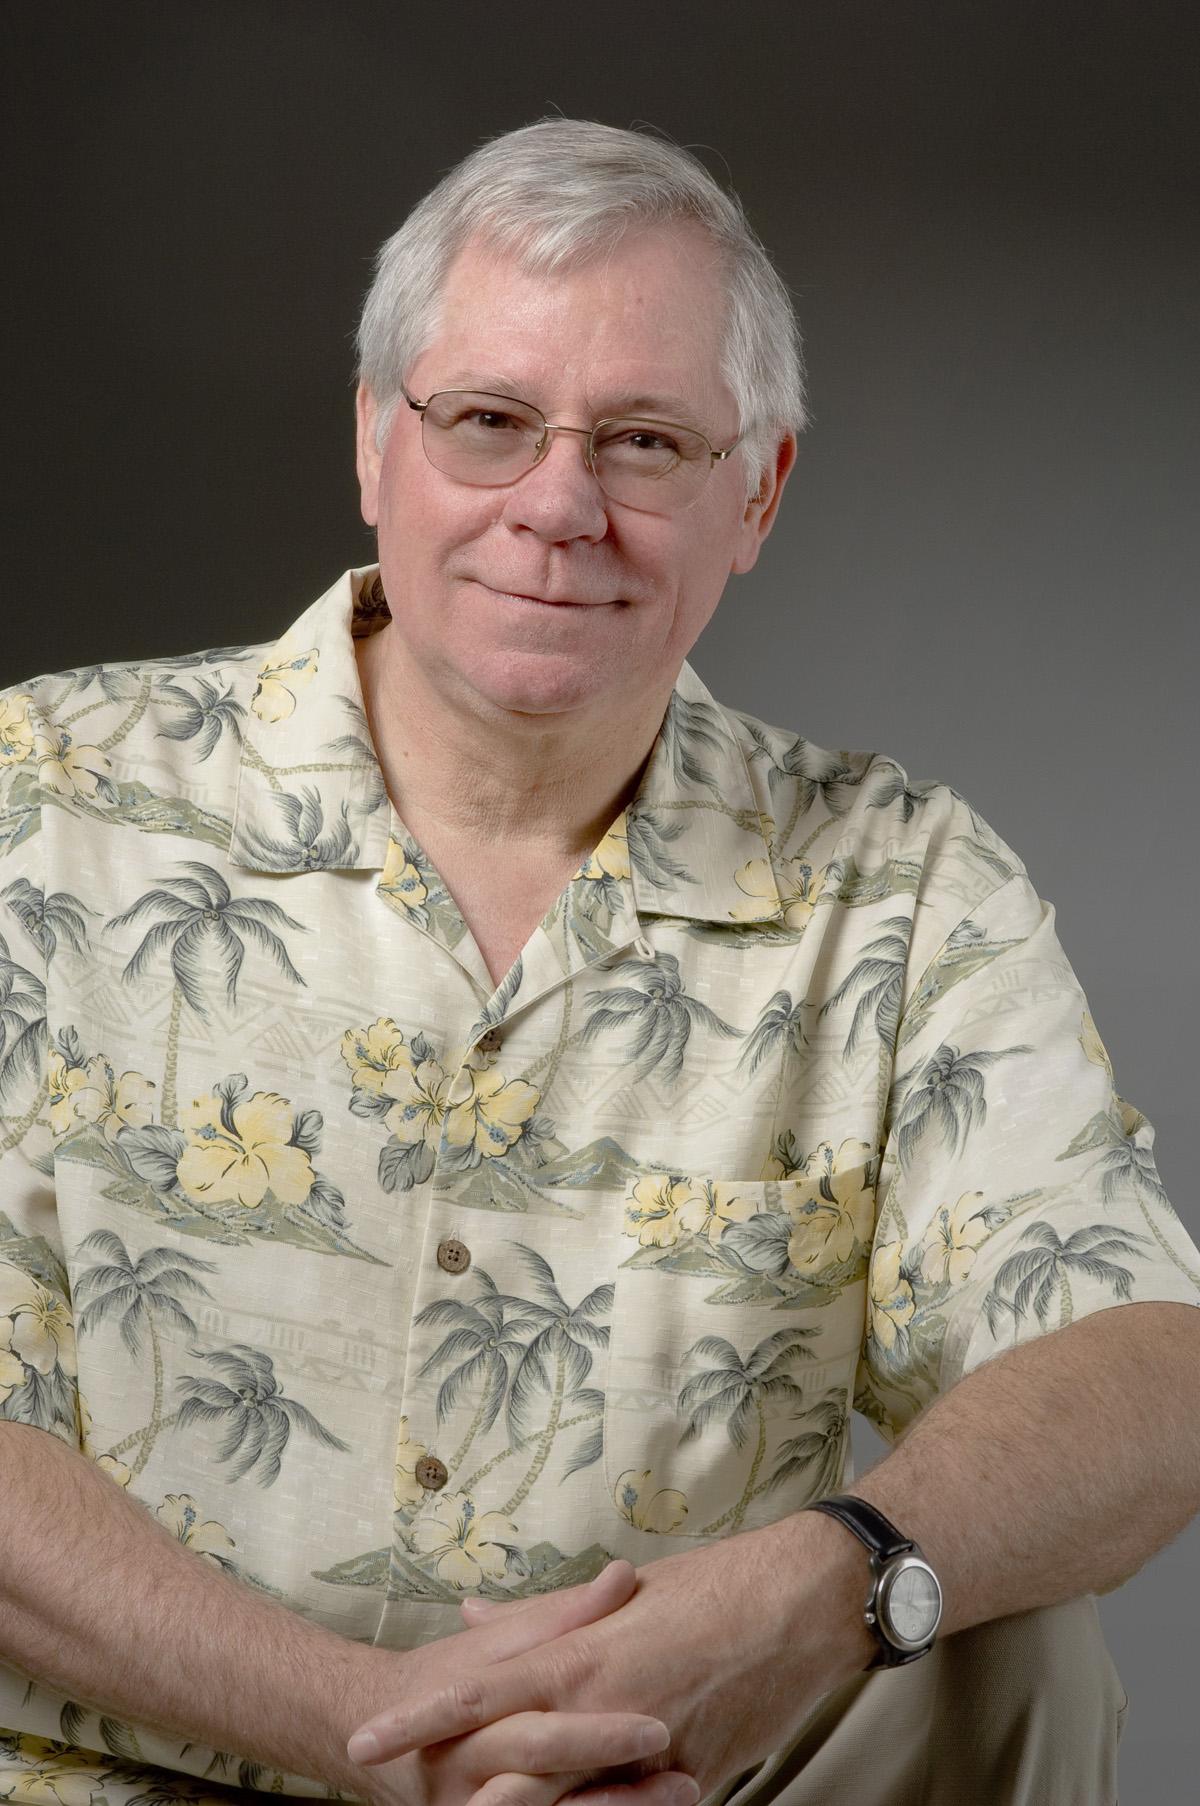 Todd A. DeMitchell